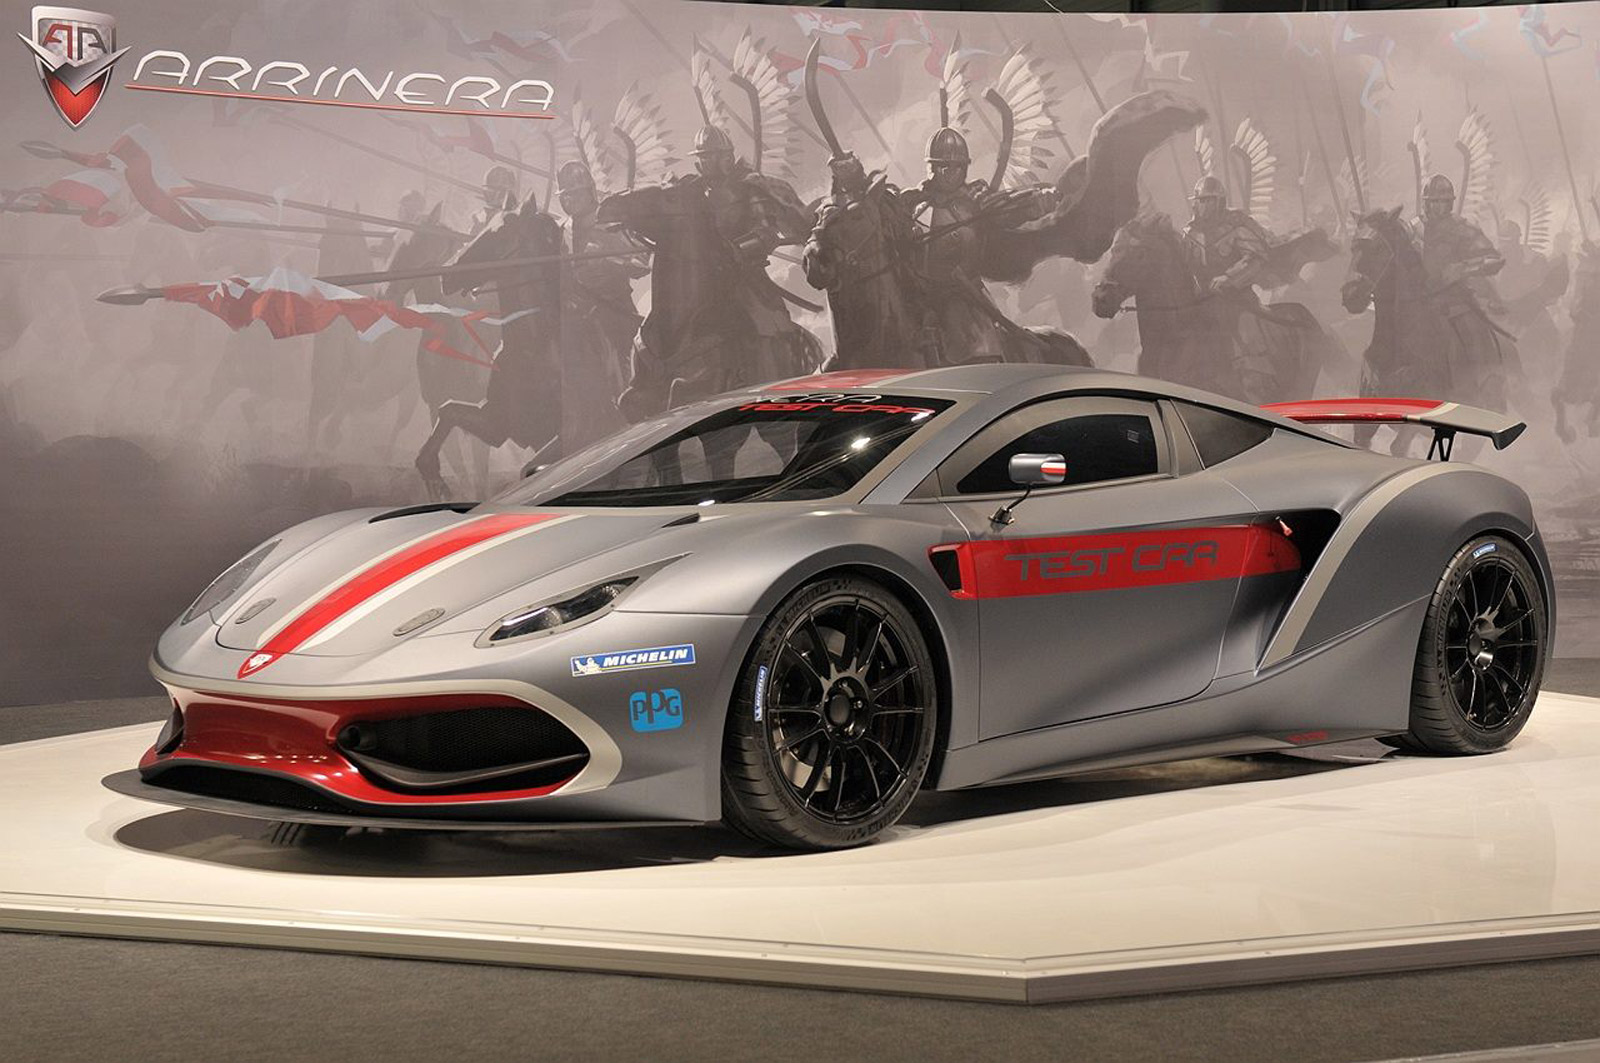 Poland S Arrinera Hussarya Supercar Makes Auto Show Debut